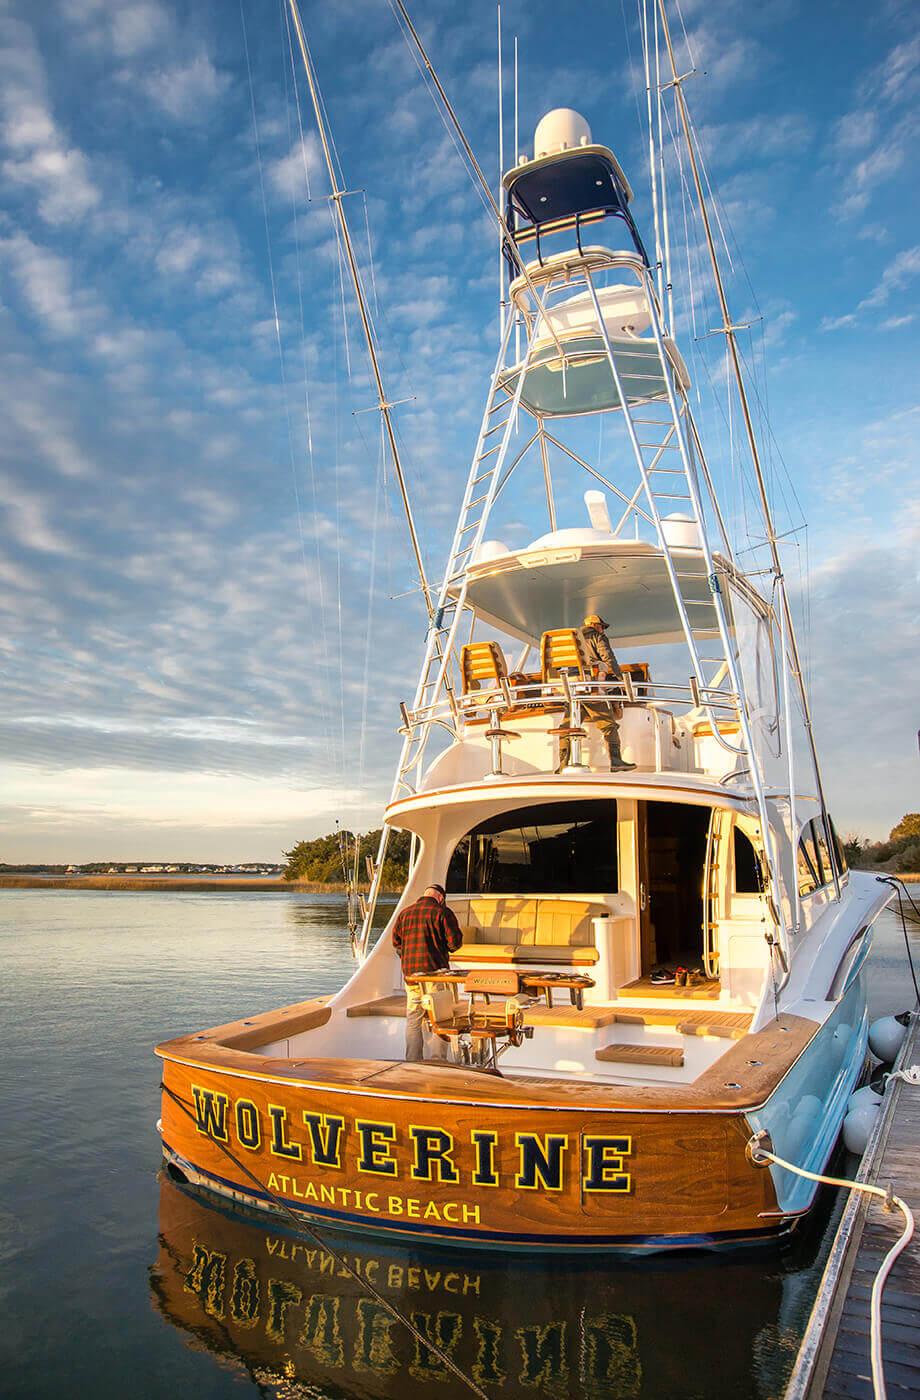 Wolverine Atlantic Beach North Carolina Faux Teak transom detail docked sportfishing boat